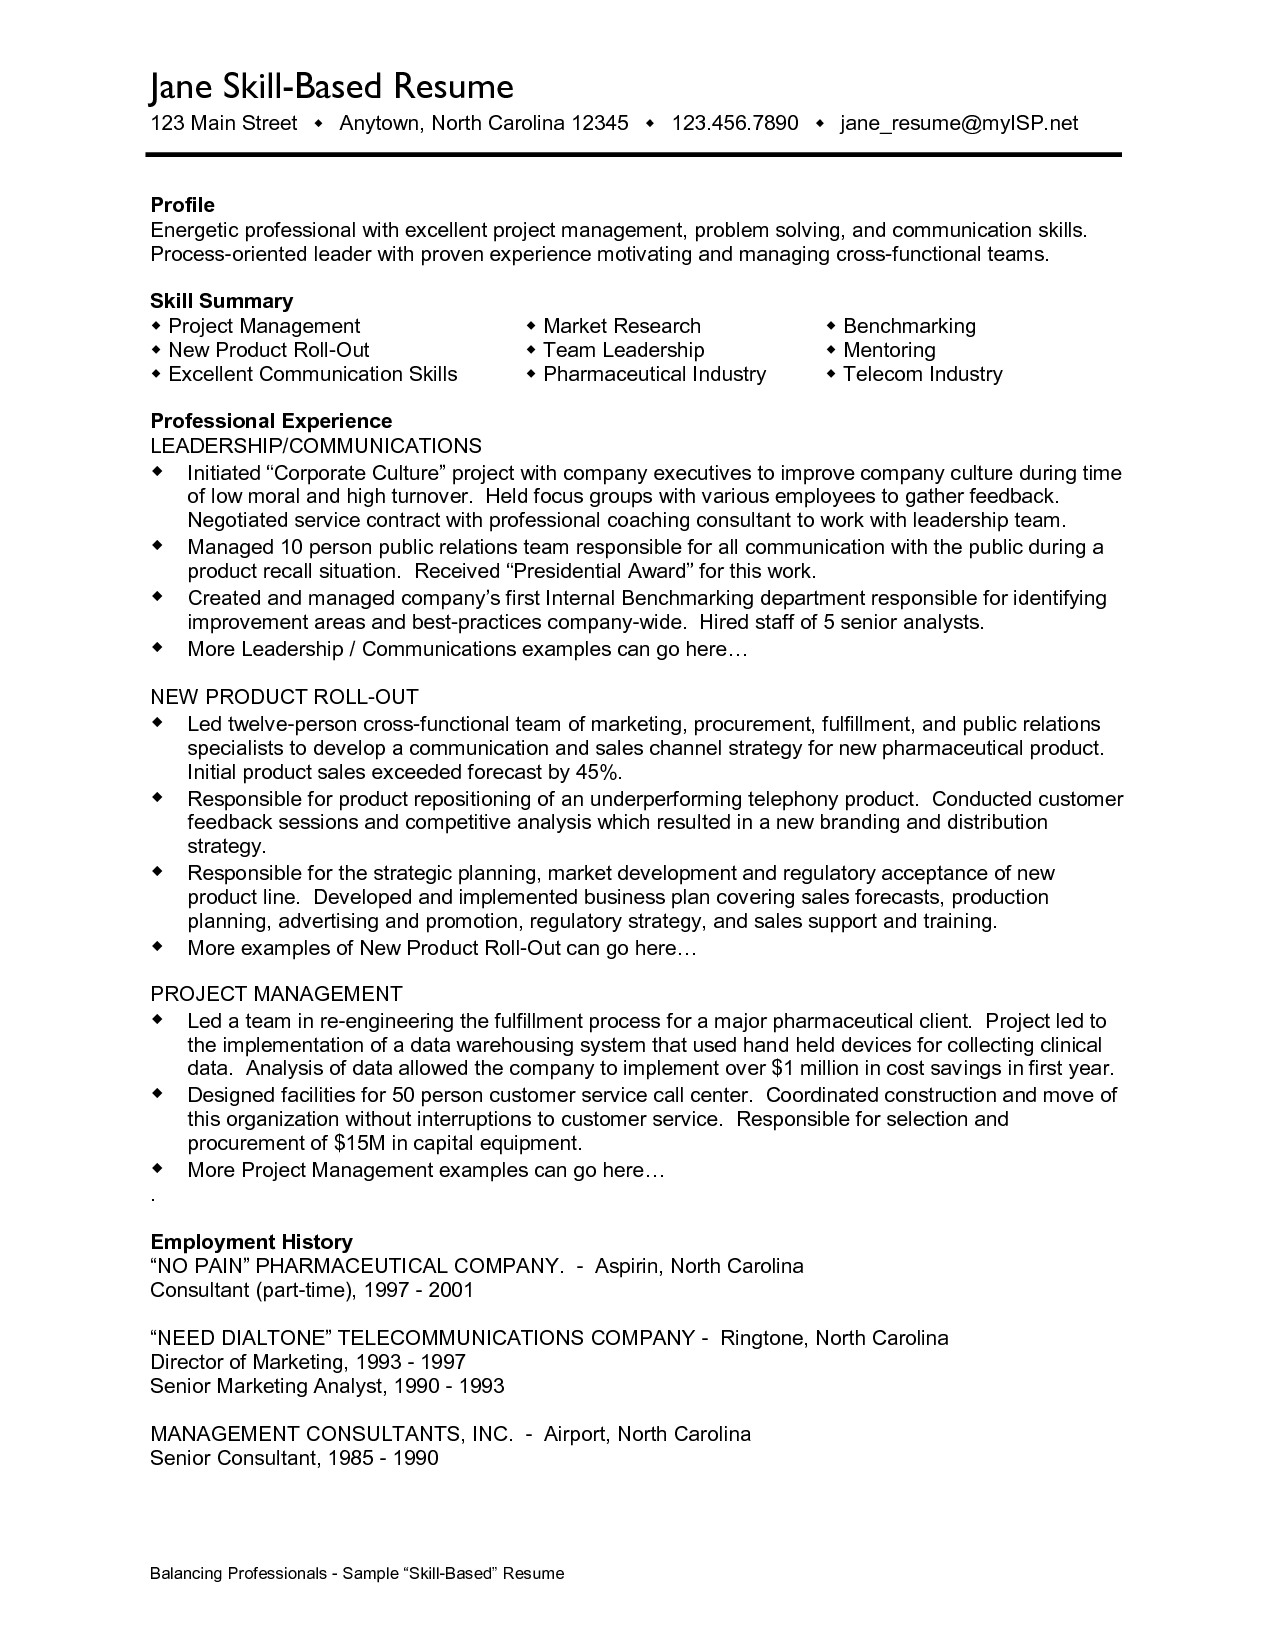 resume for internship skills